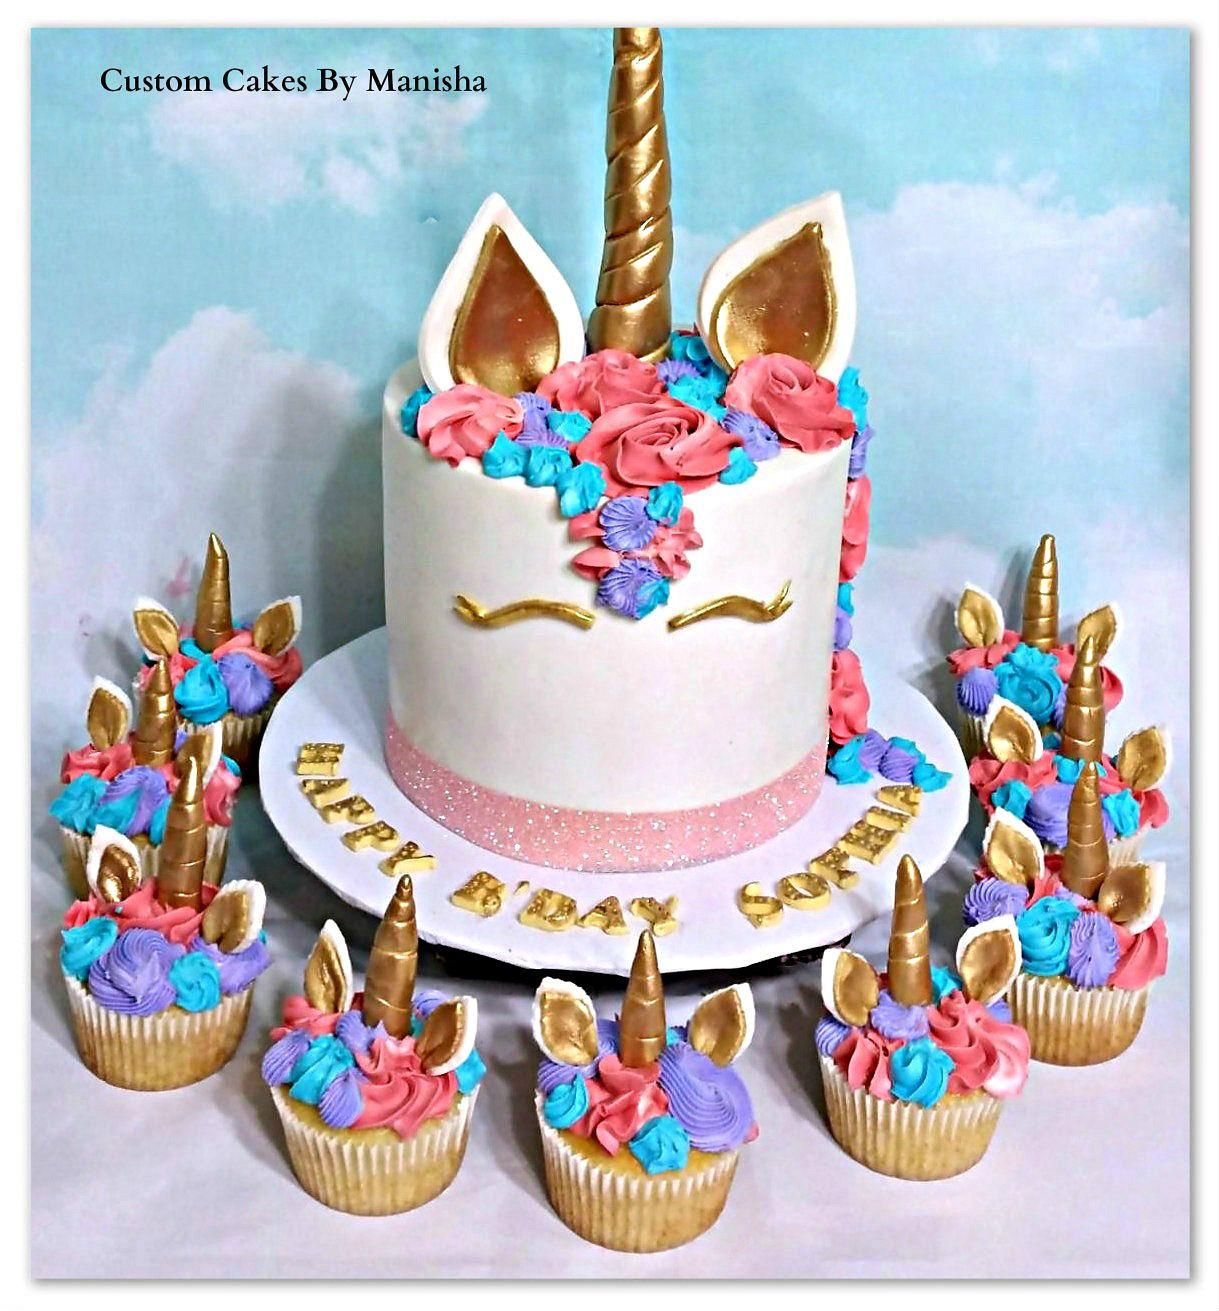 Unicorn Themed Cake and Cupcakes Cakes By Manisha Pinterest